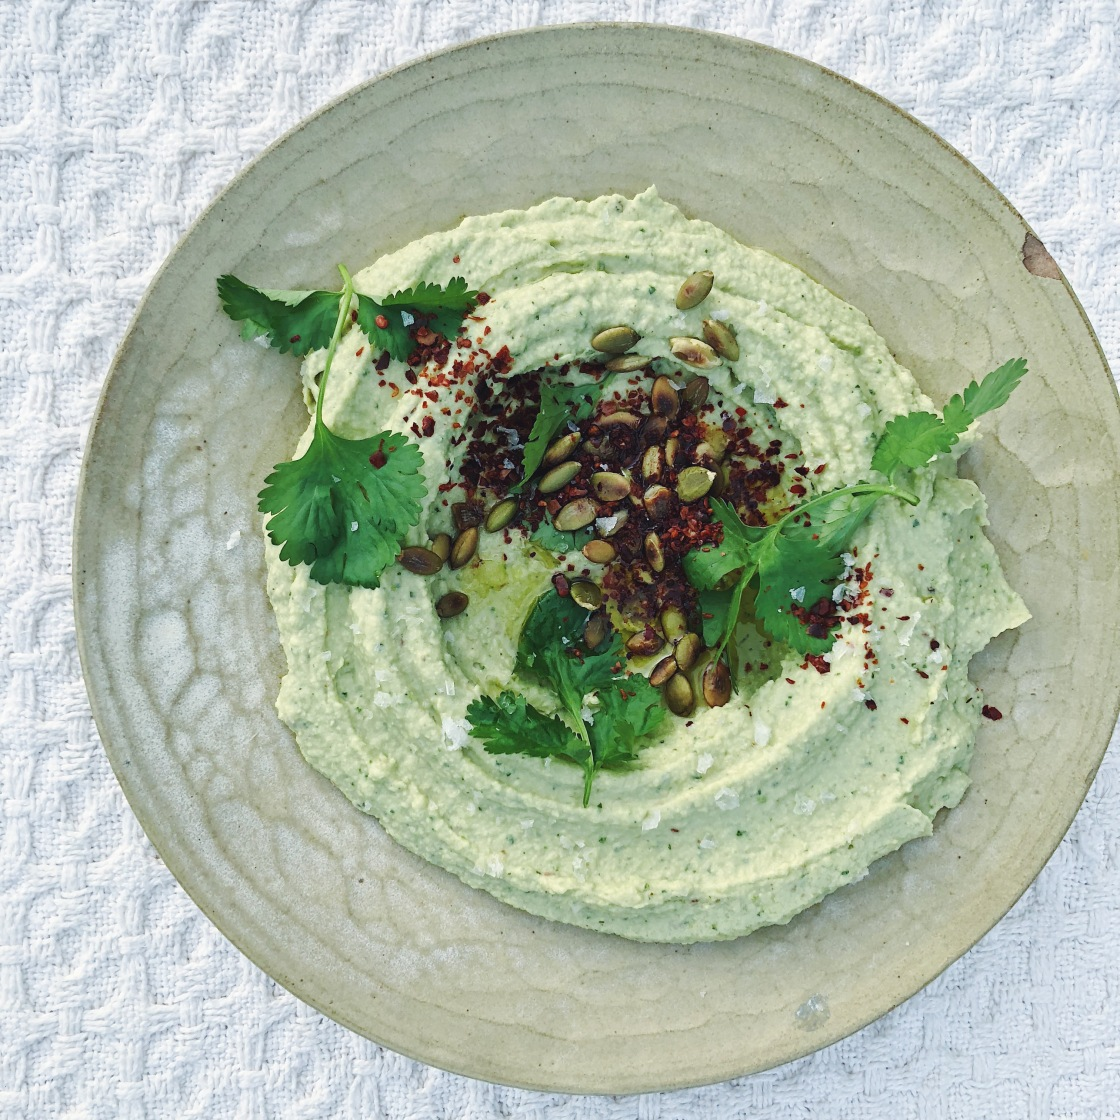 vegan avocado hummus cilantro gluten free plant based